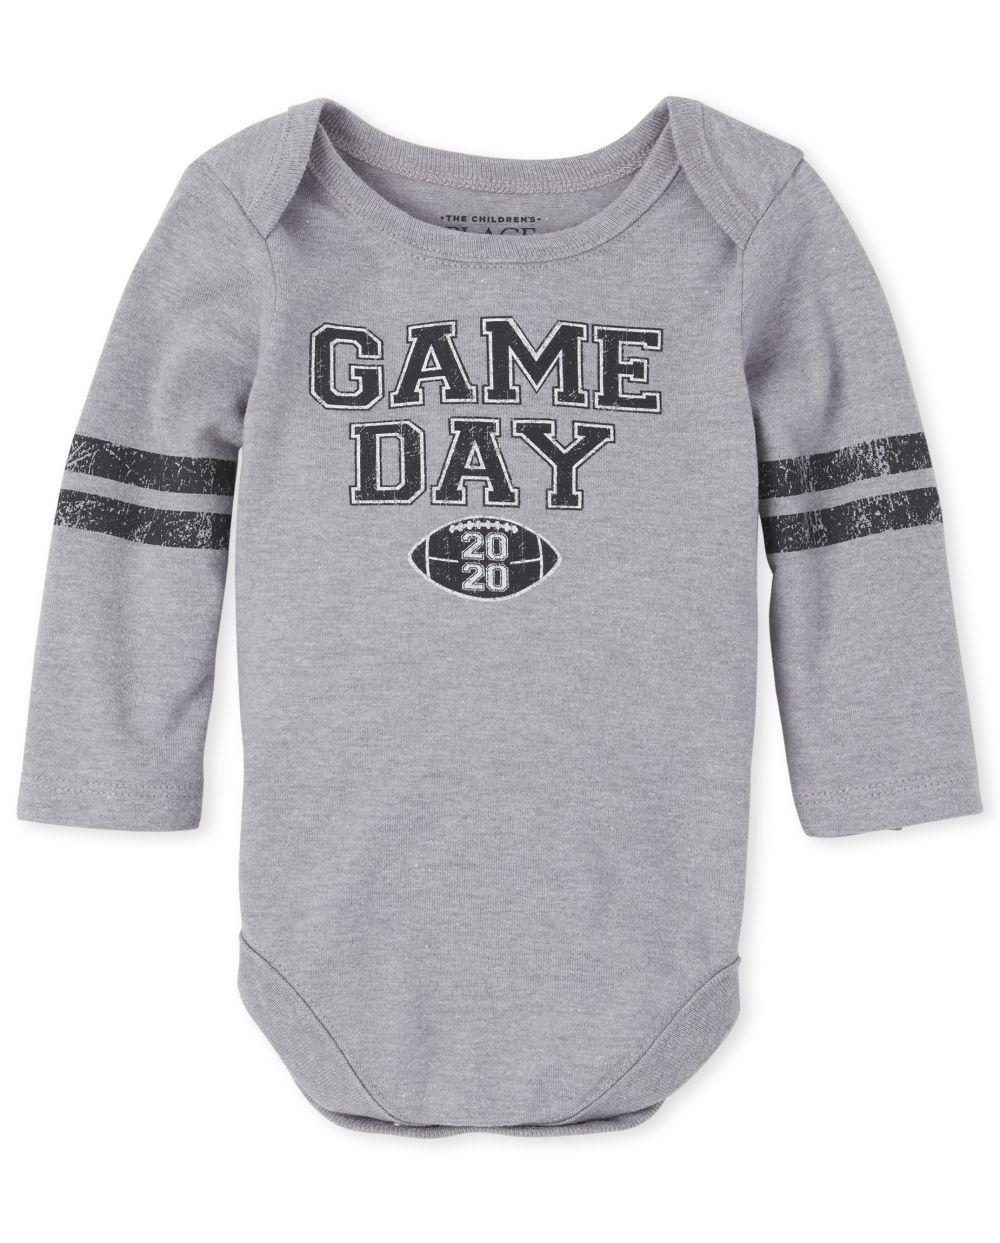 Unisex Baby Matching Family Football Graphic Bodysuit